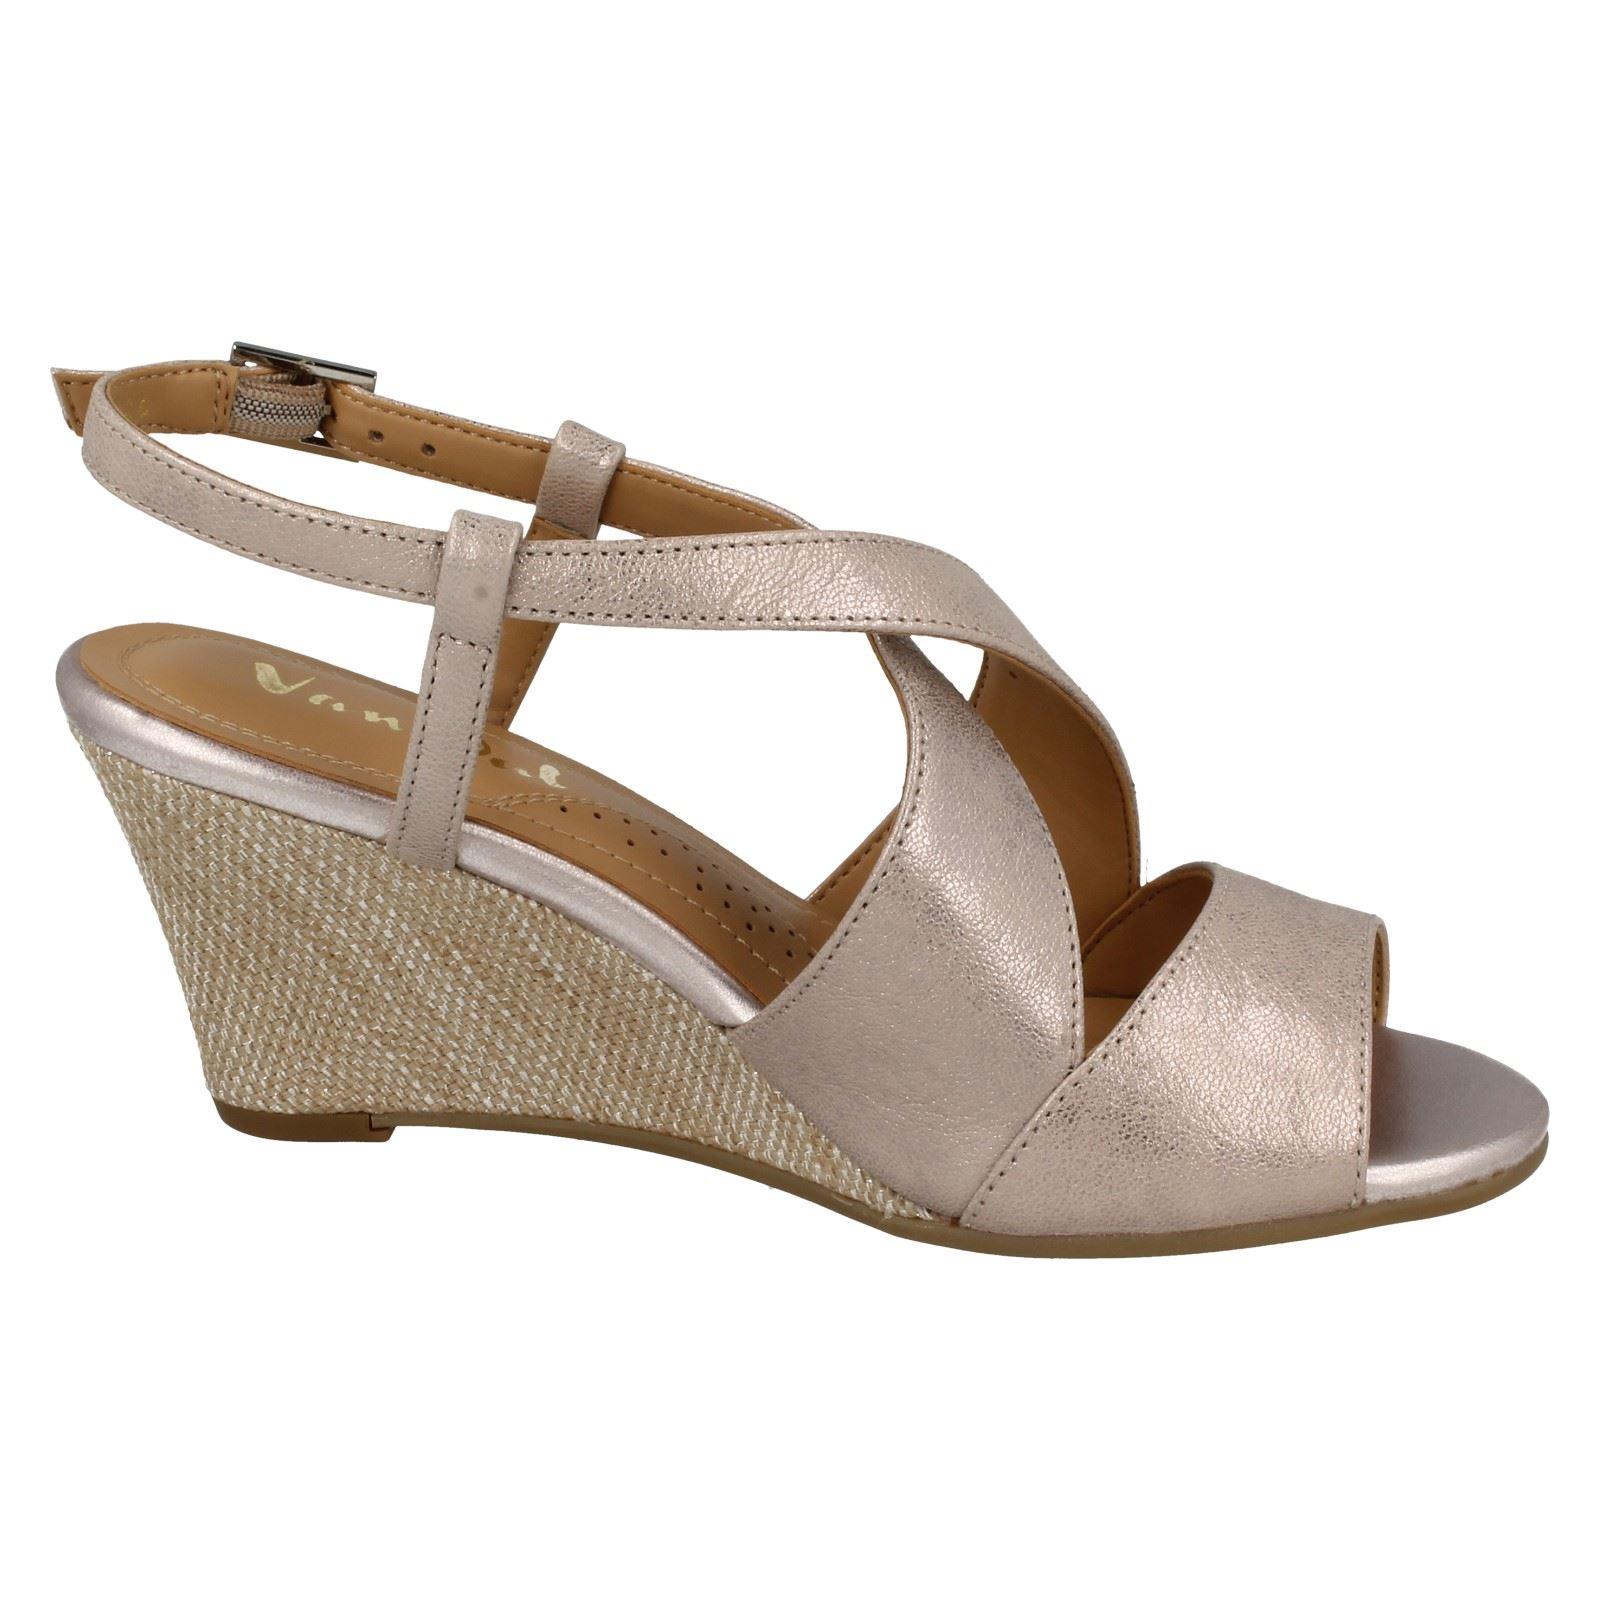 Ladies-Van-Dal-Cross-Strap-Wedged-Sandal-Allora thumbnail 3